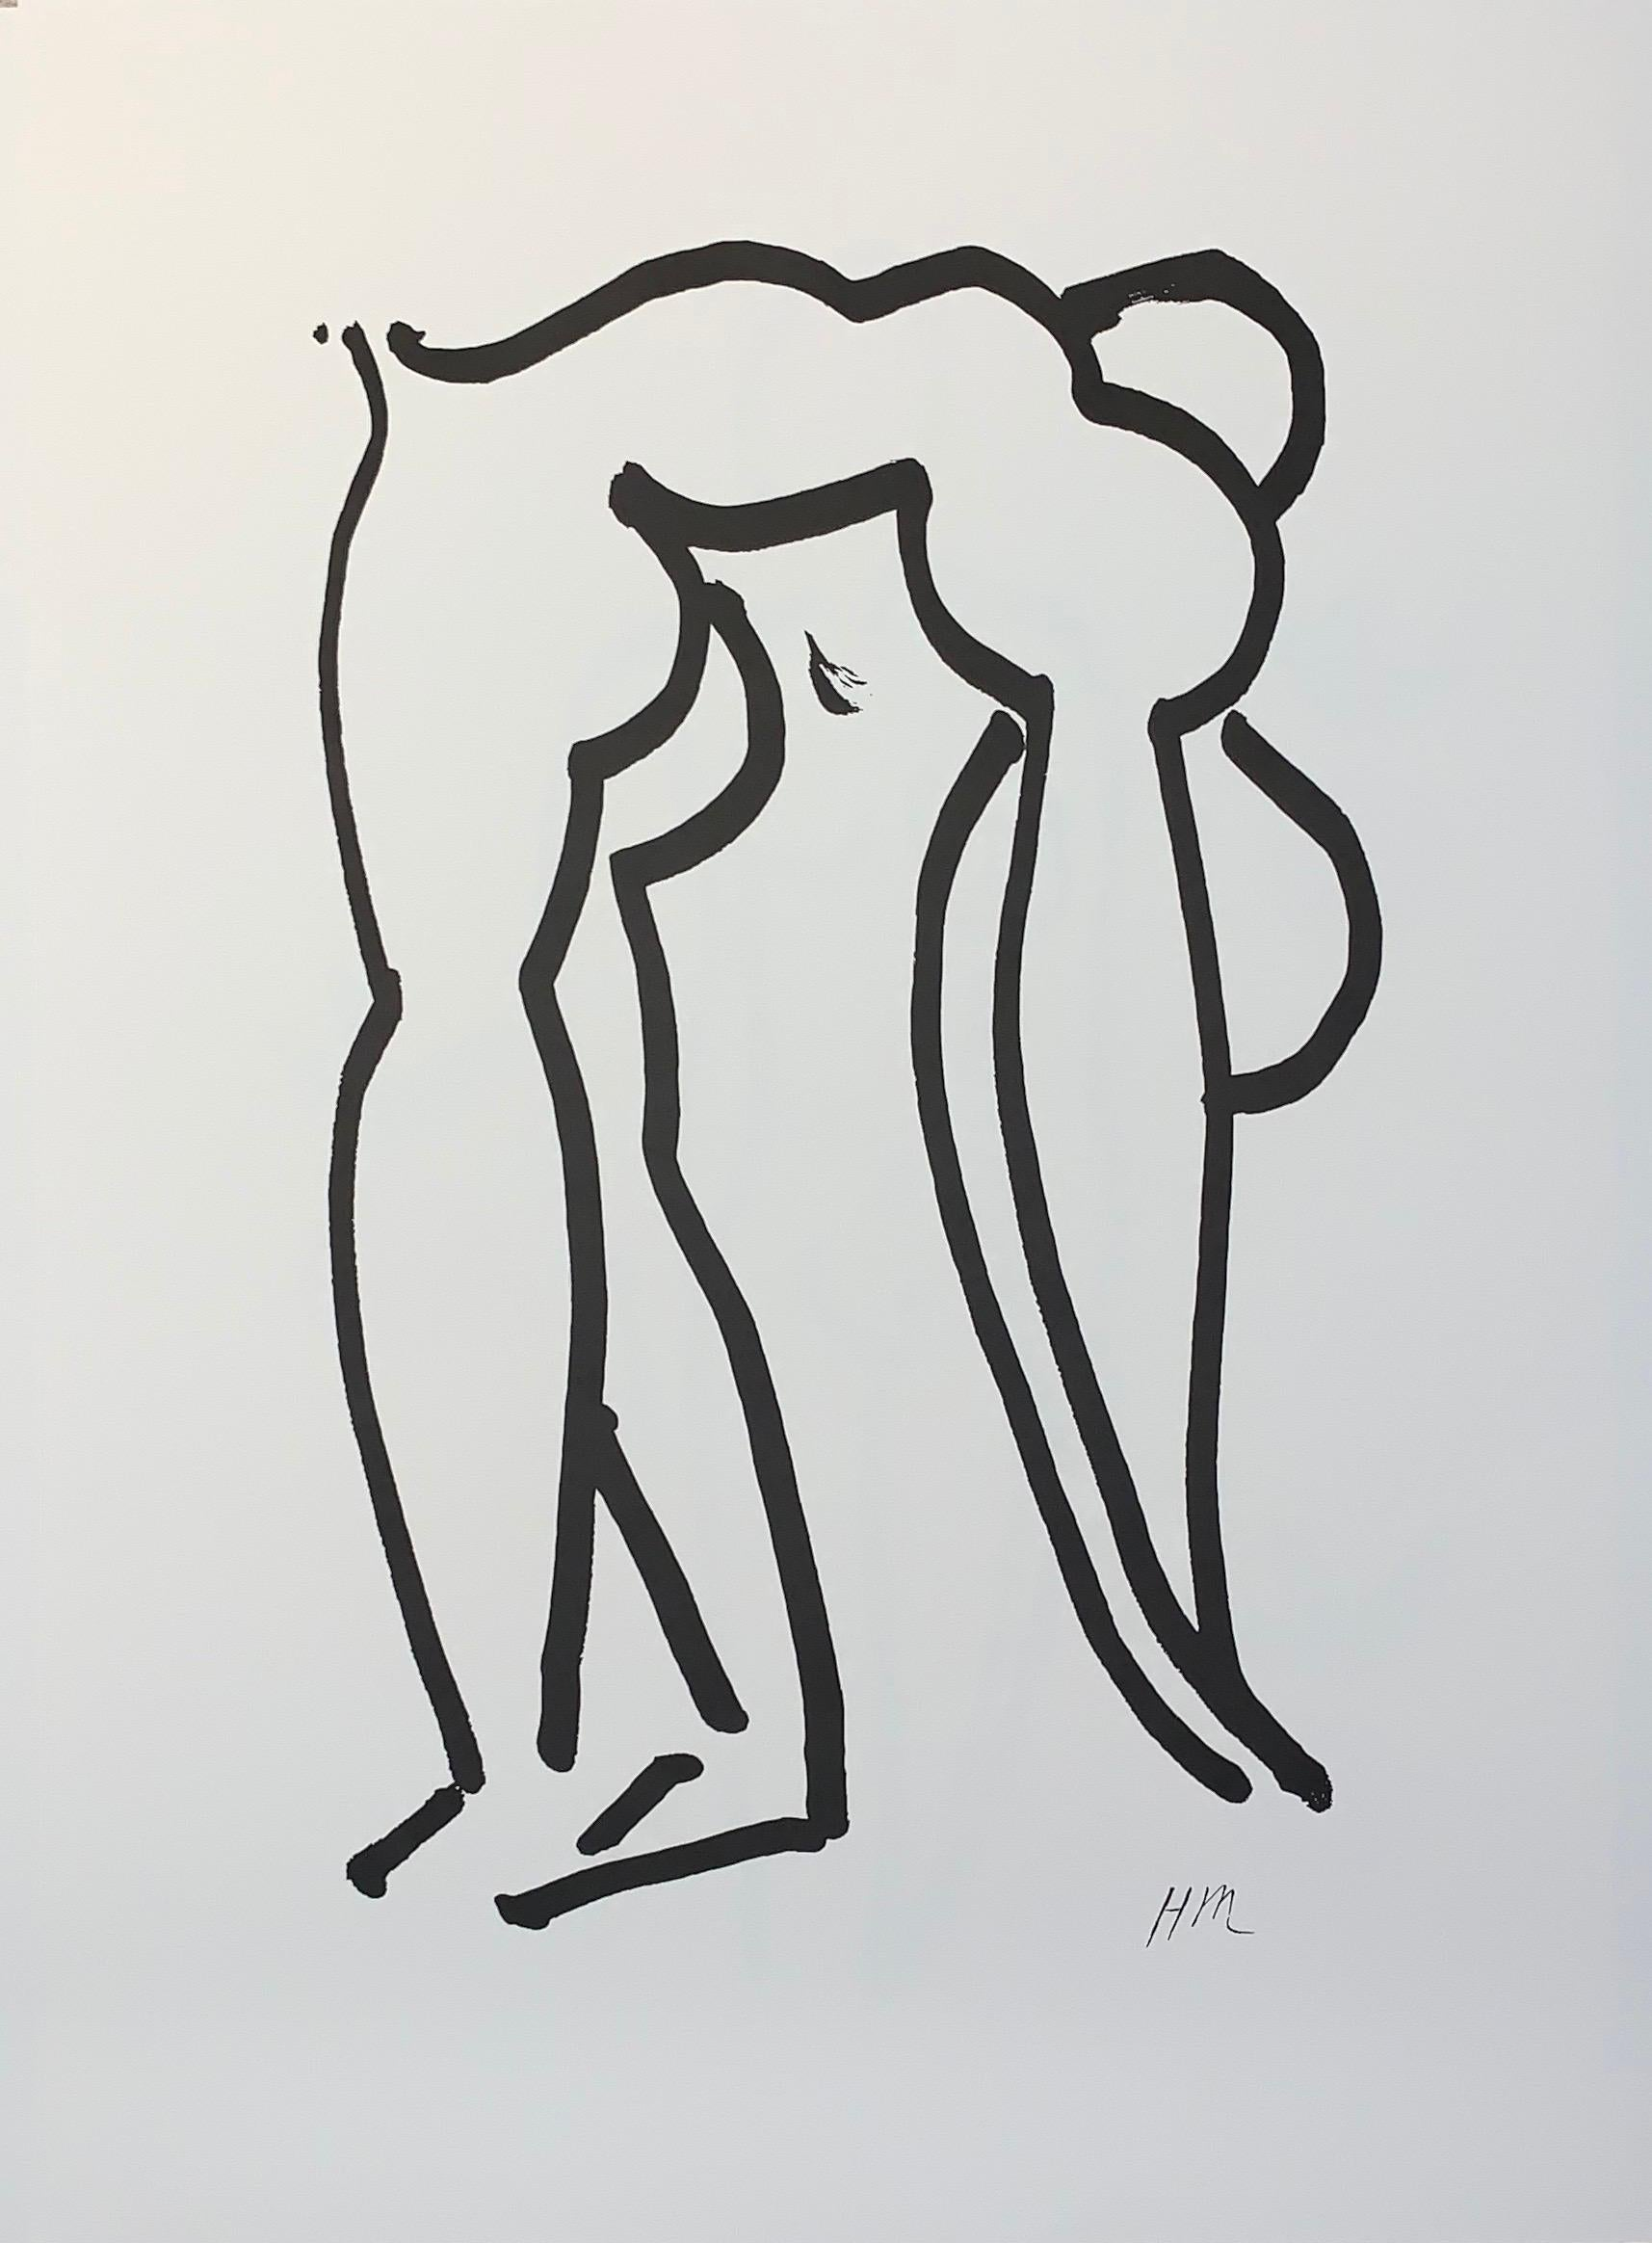 L'Acrobate - Color Lithograph - 2007 - Henri Matisse